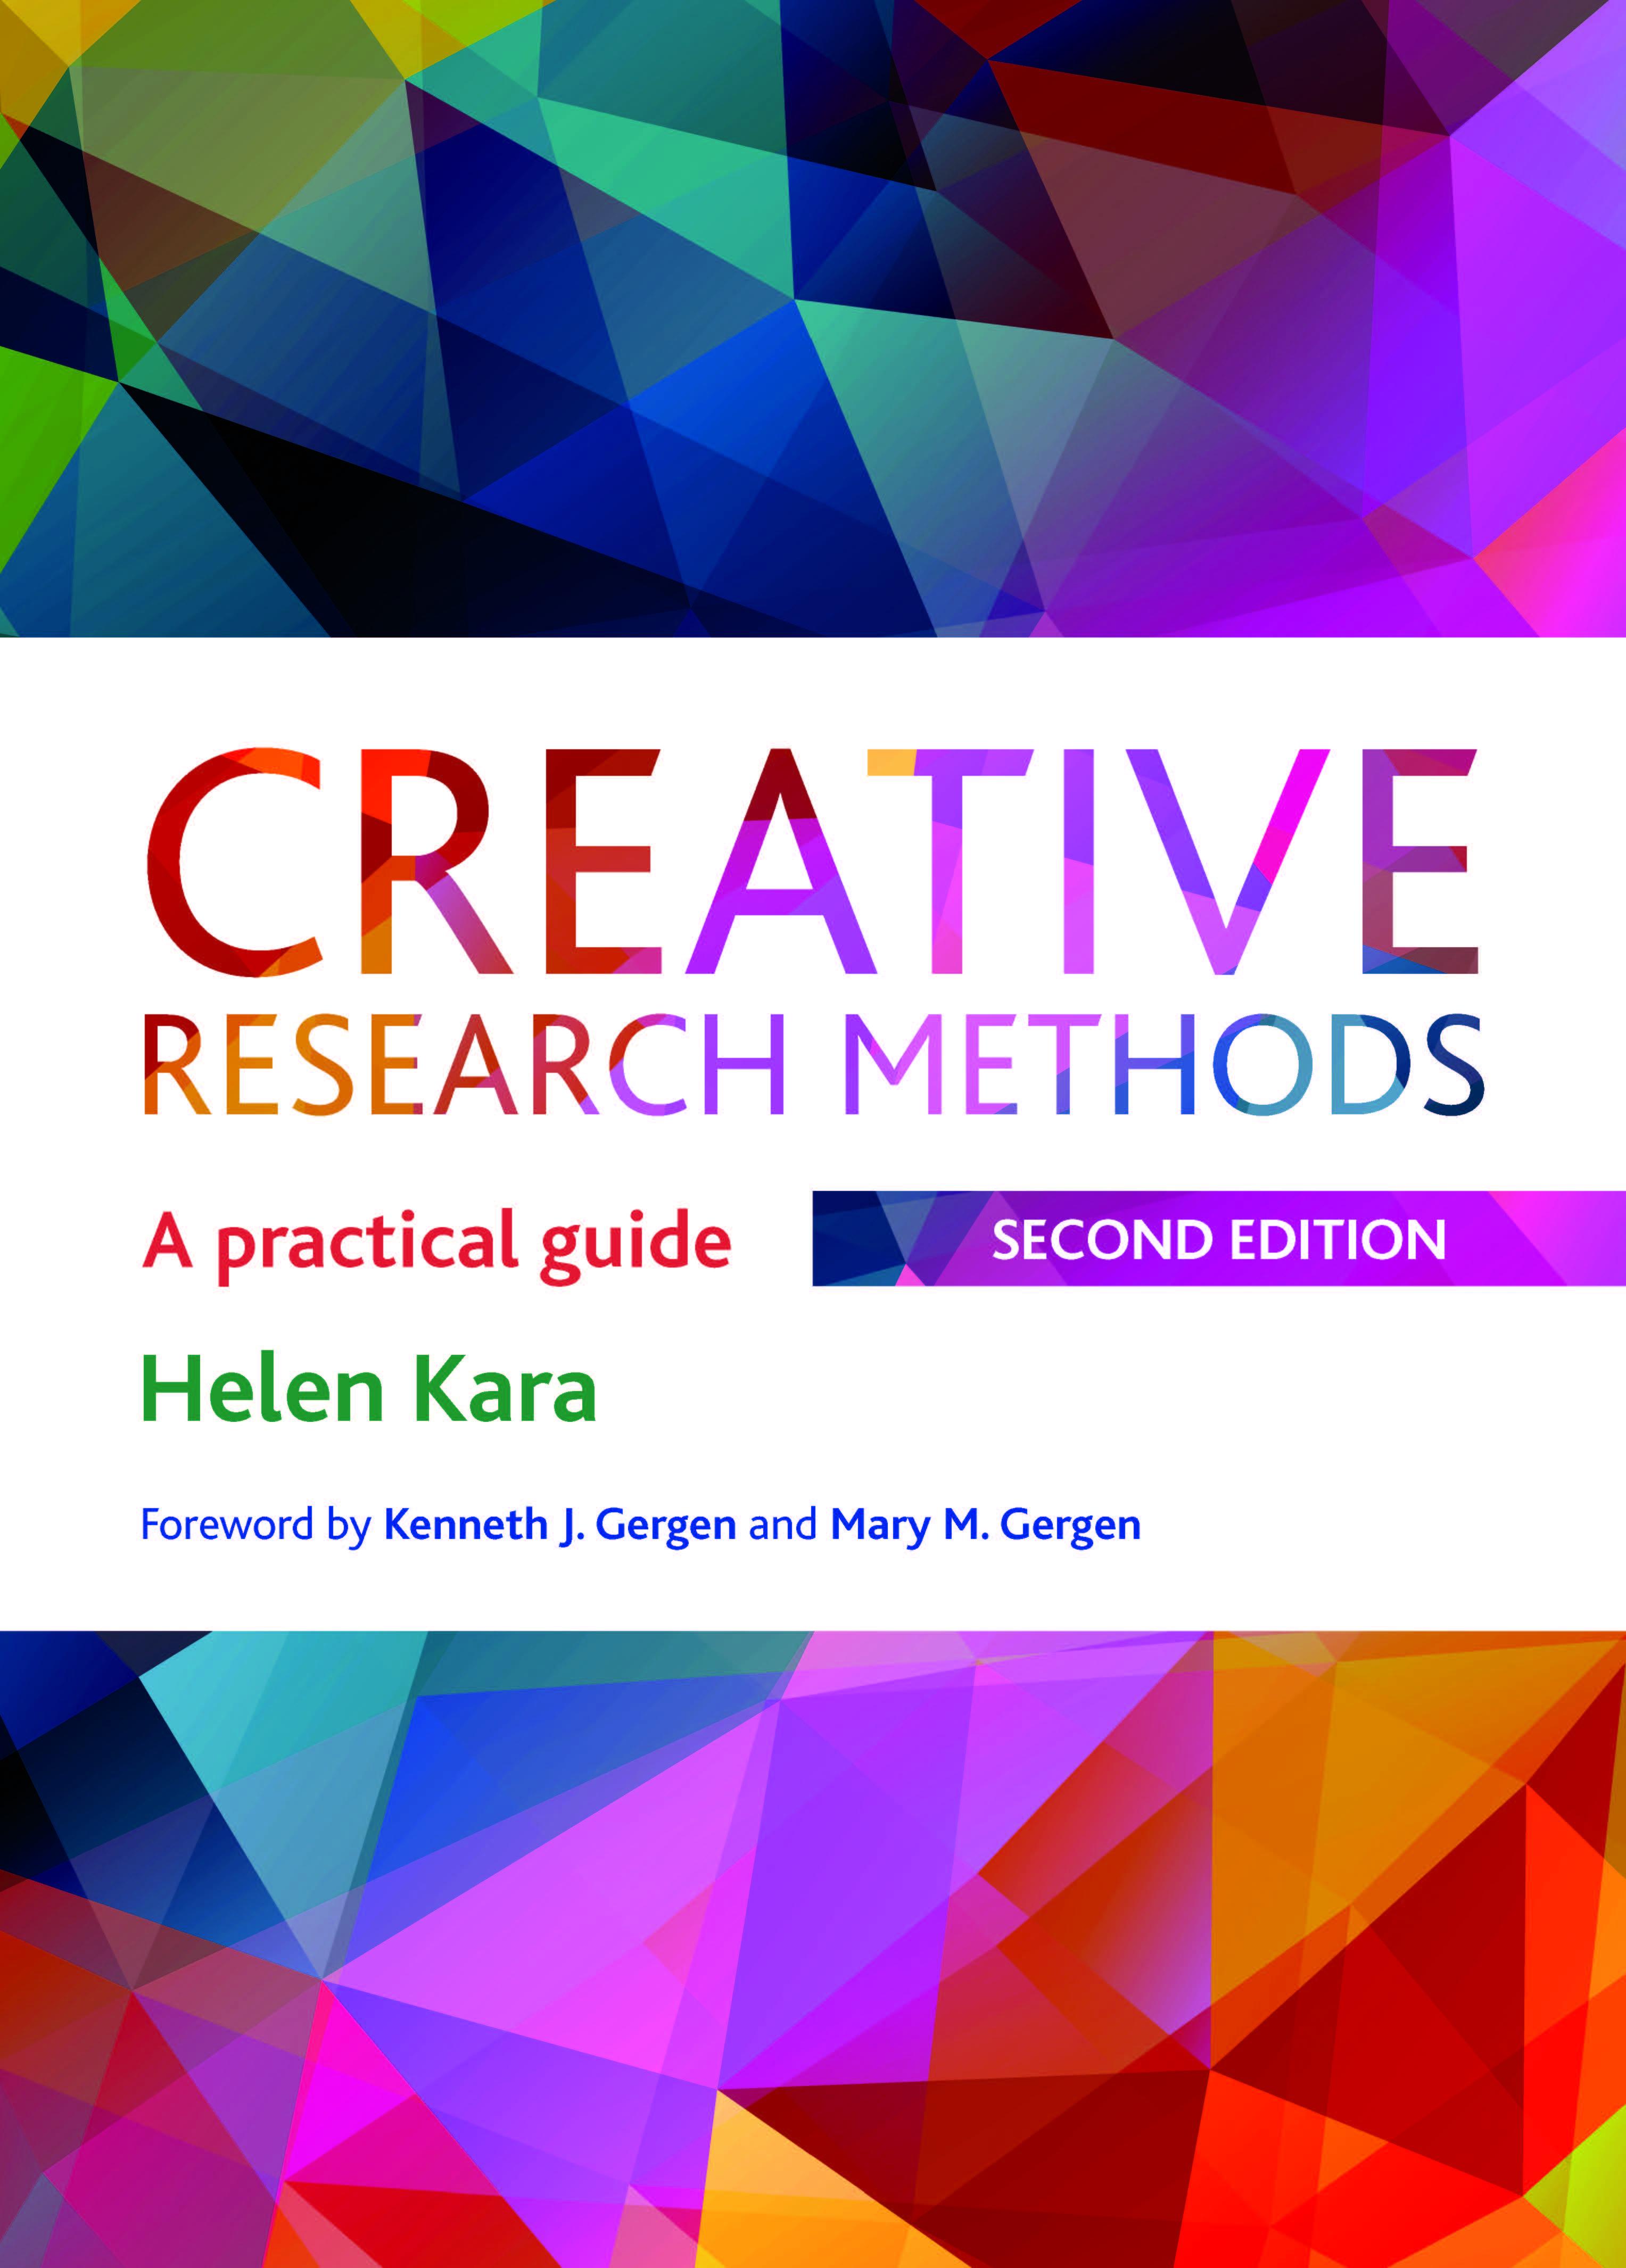 Book Giveaway! | Helen Kara